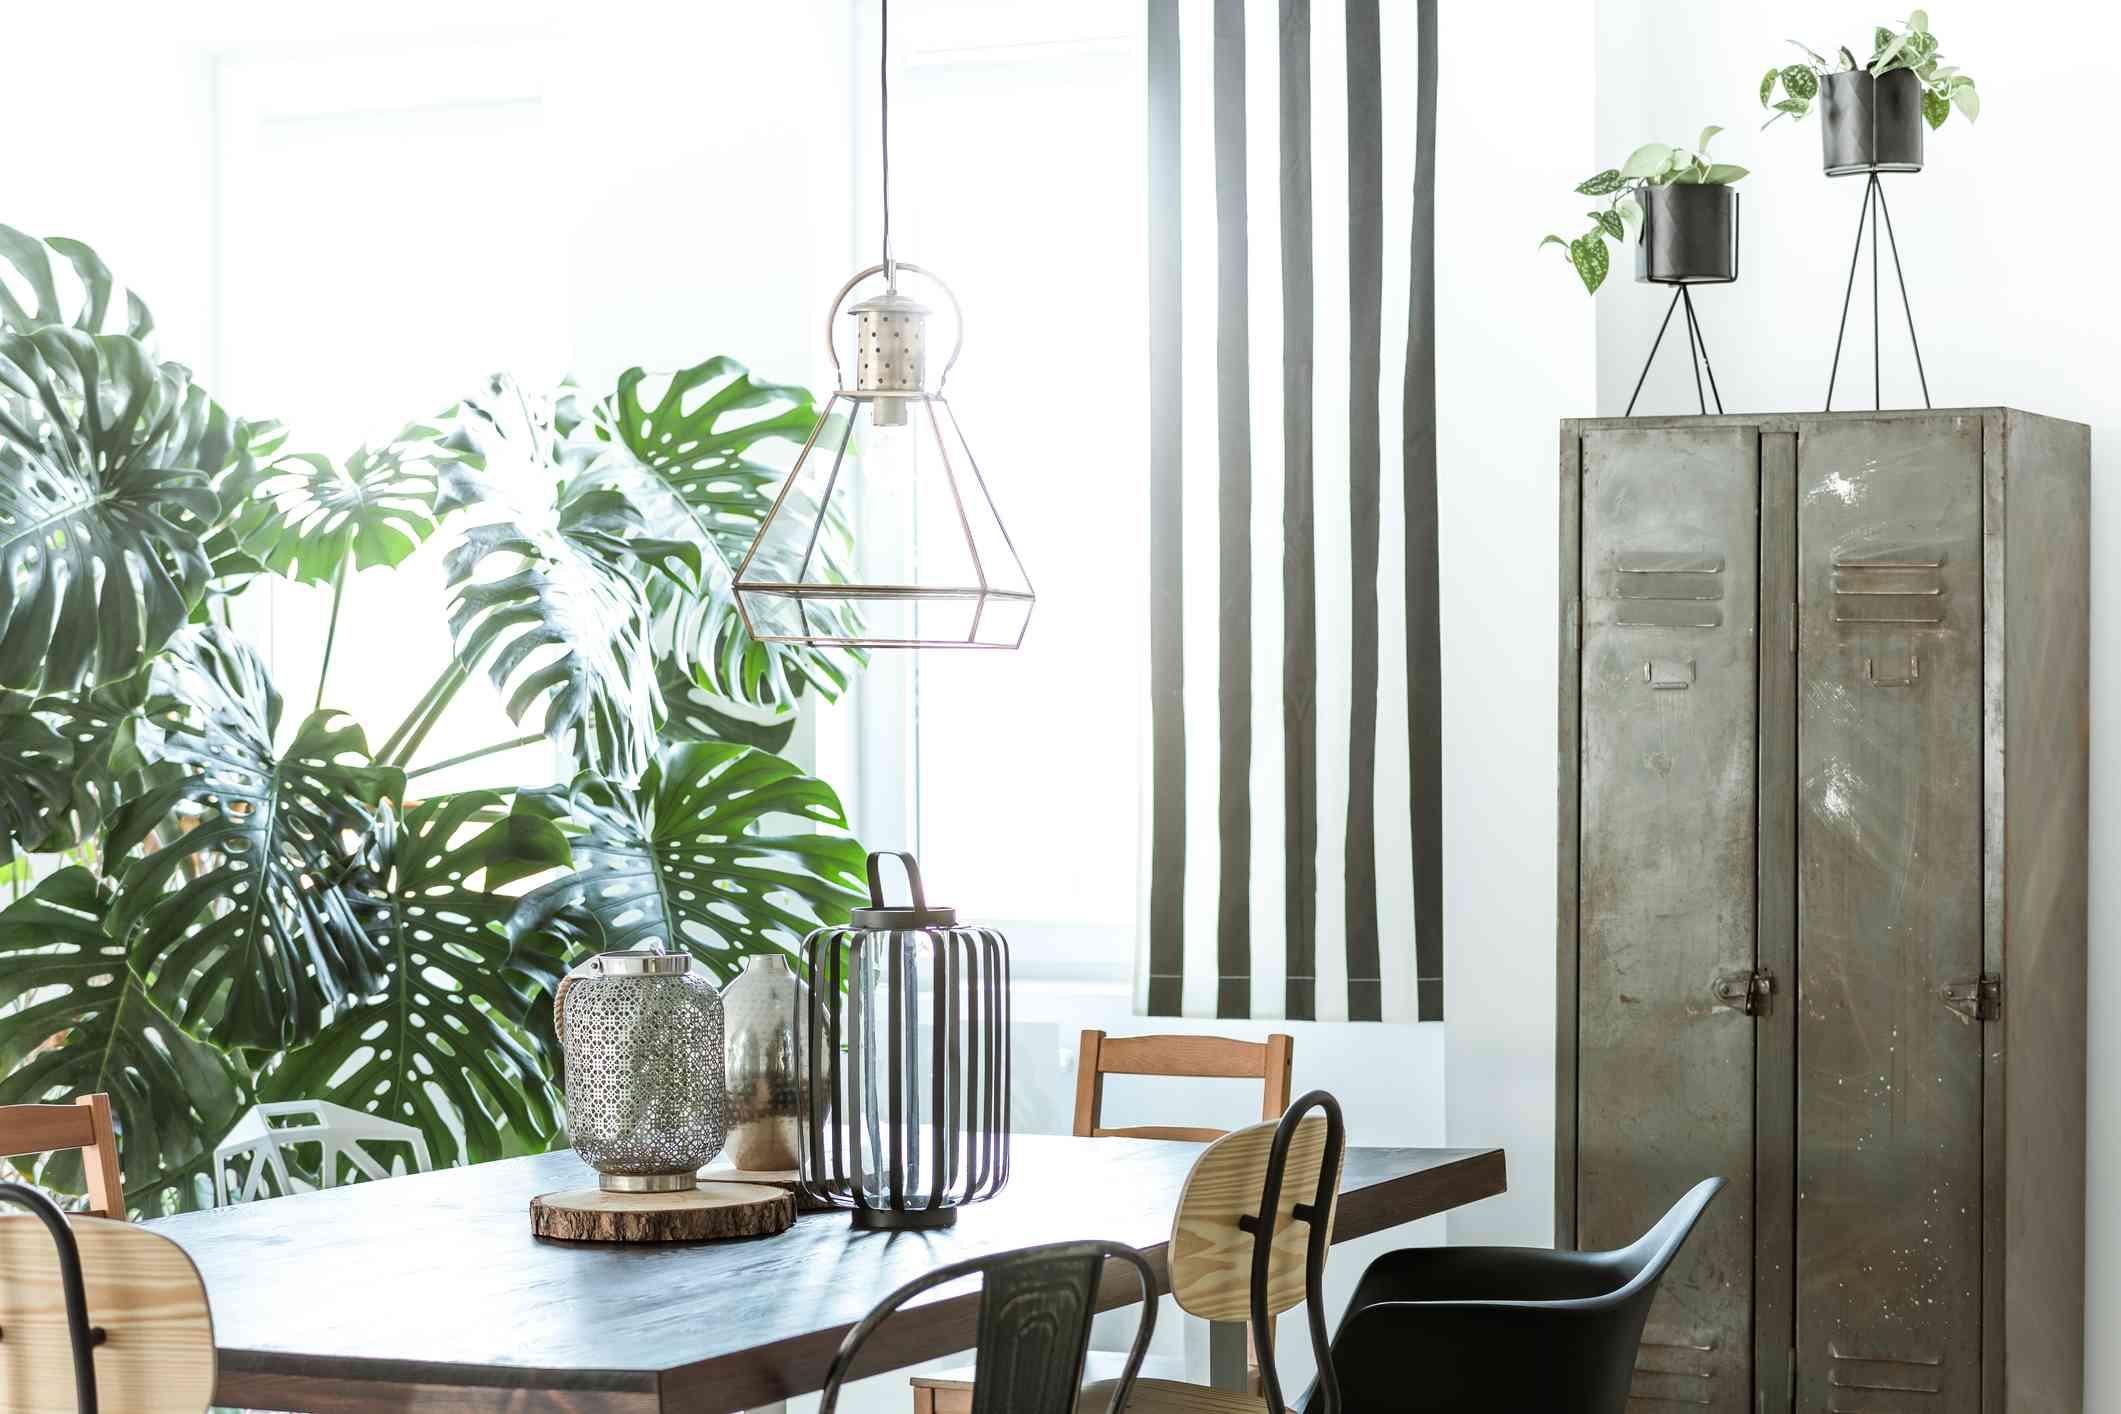 Plants in a garage.